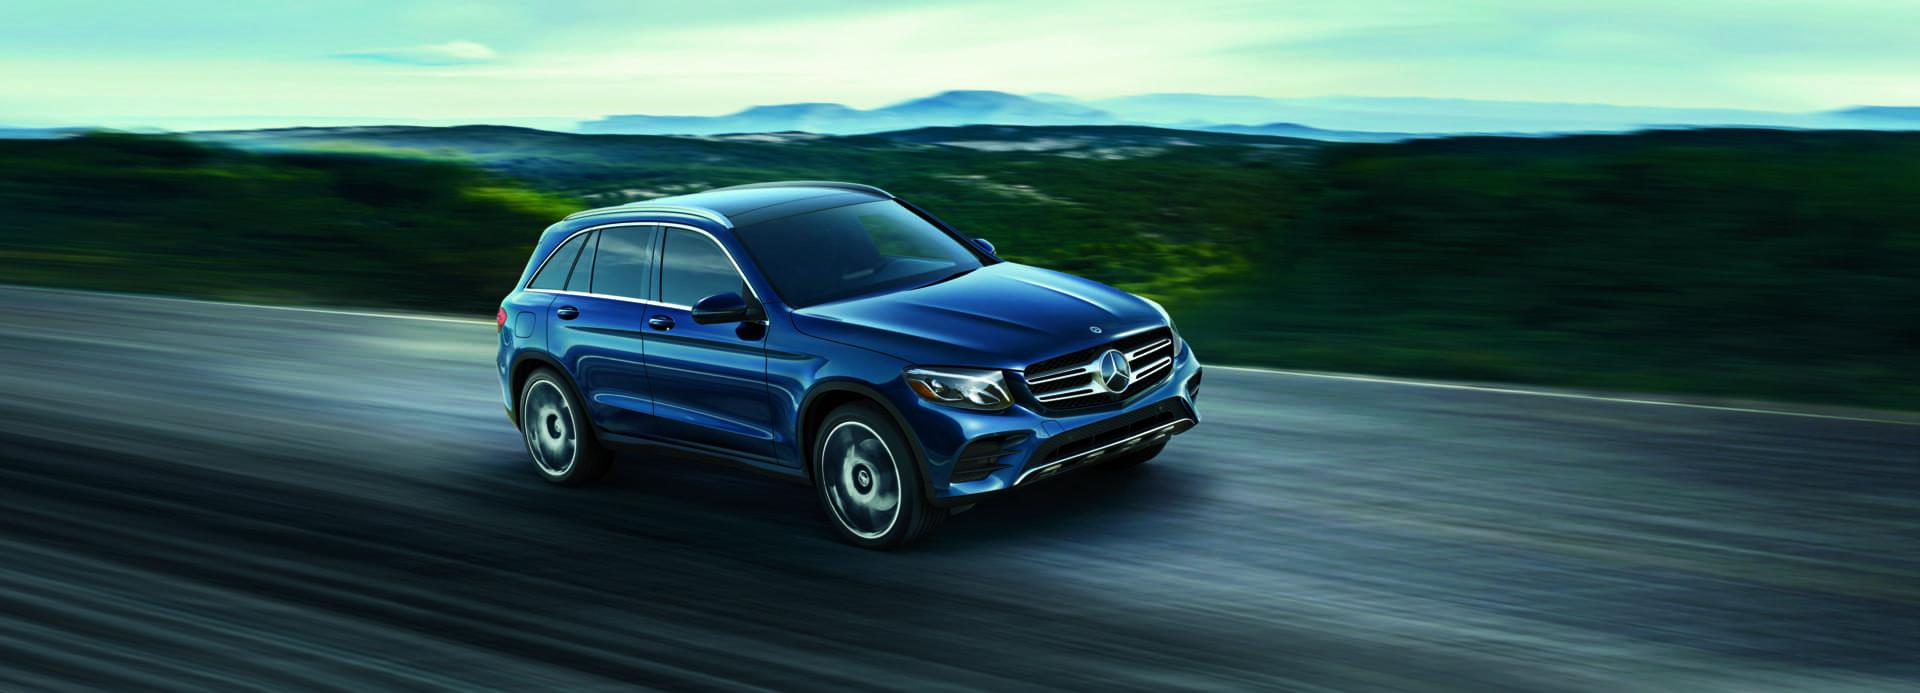 Mercedes Benz Dealership >> Mercedes Benz Of West Covina Mercedes Benz Dealer Near La